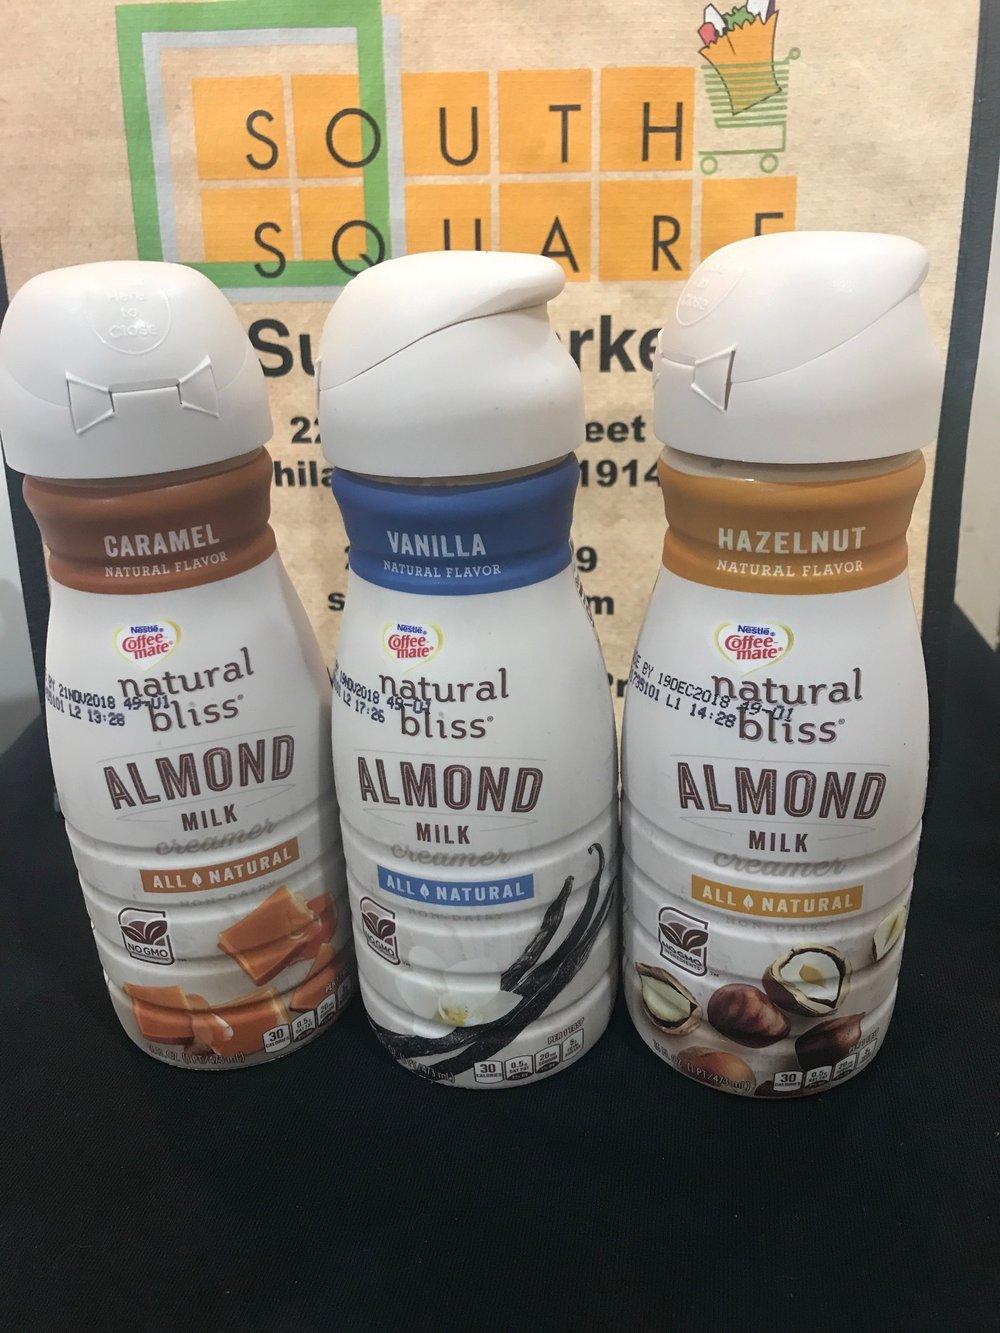 Almond Milk CoffeeMate